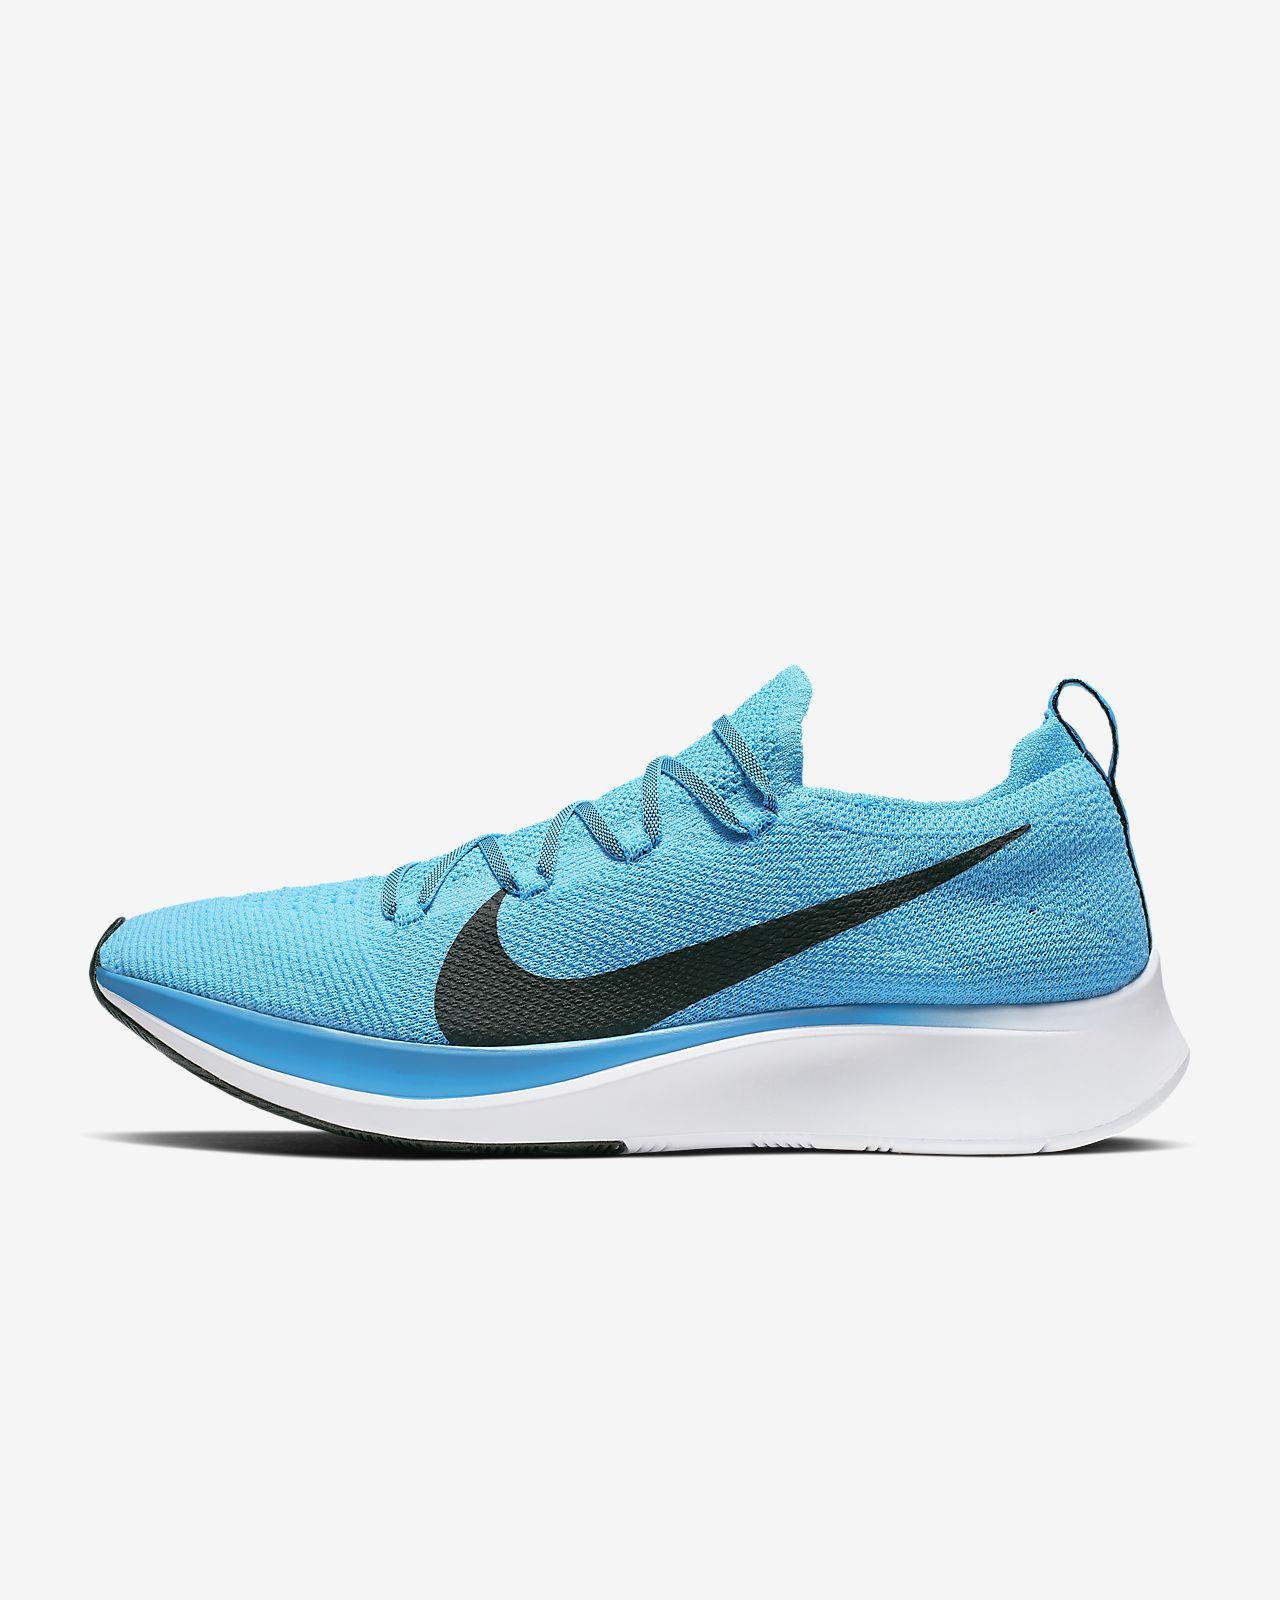 46cc83a948d84 Calzado de running para hombre Nike Zoom Fly Flyknit. Nike.com MX